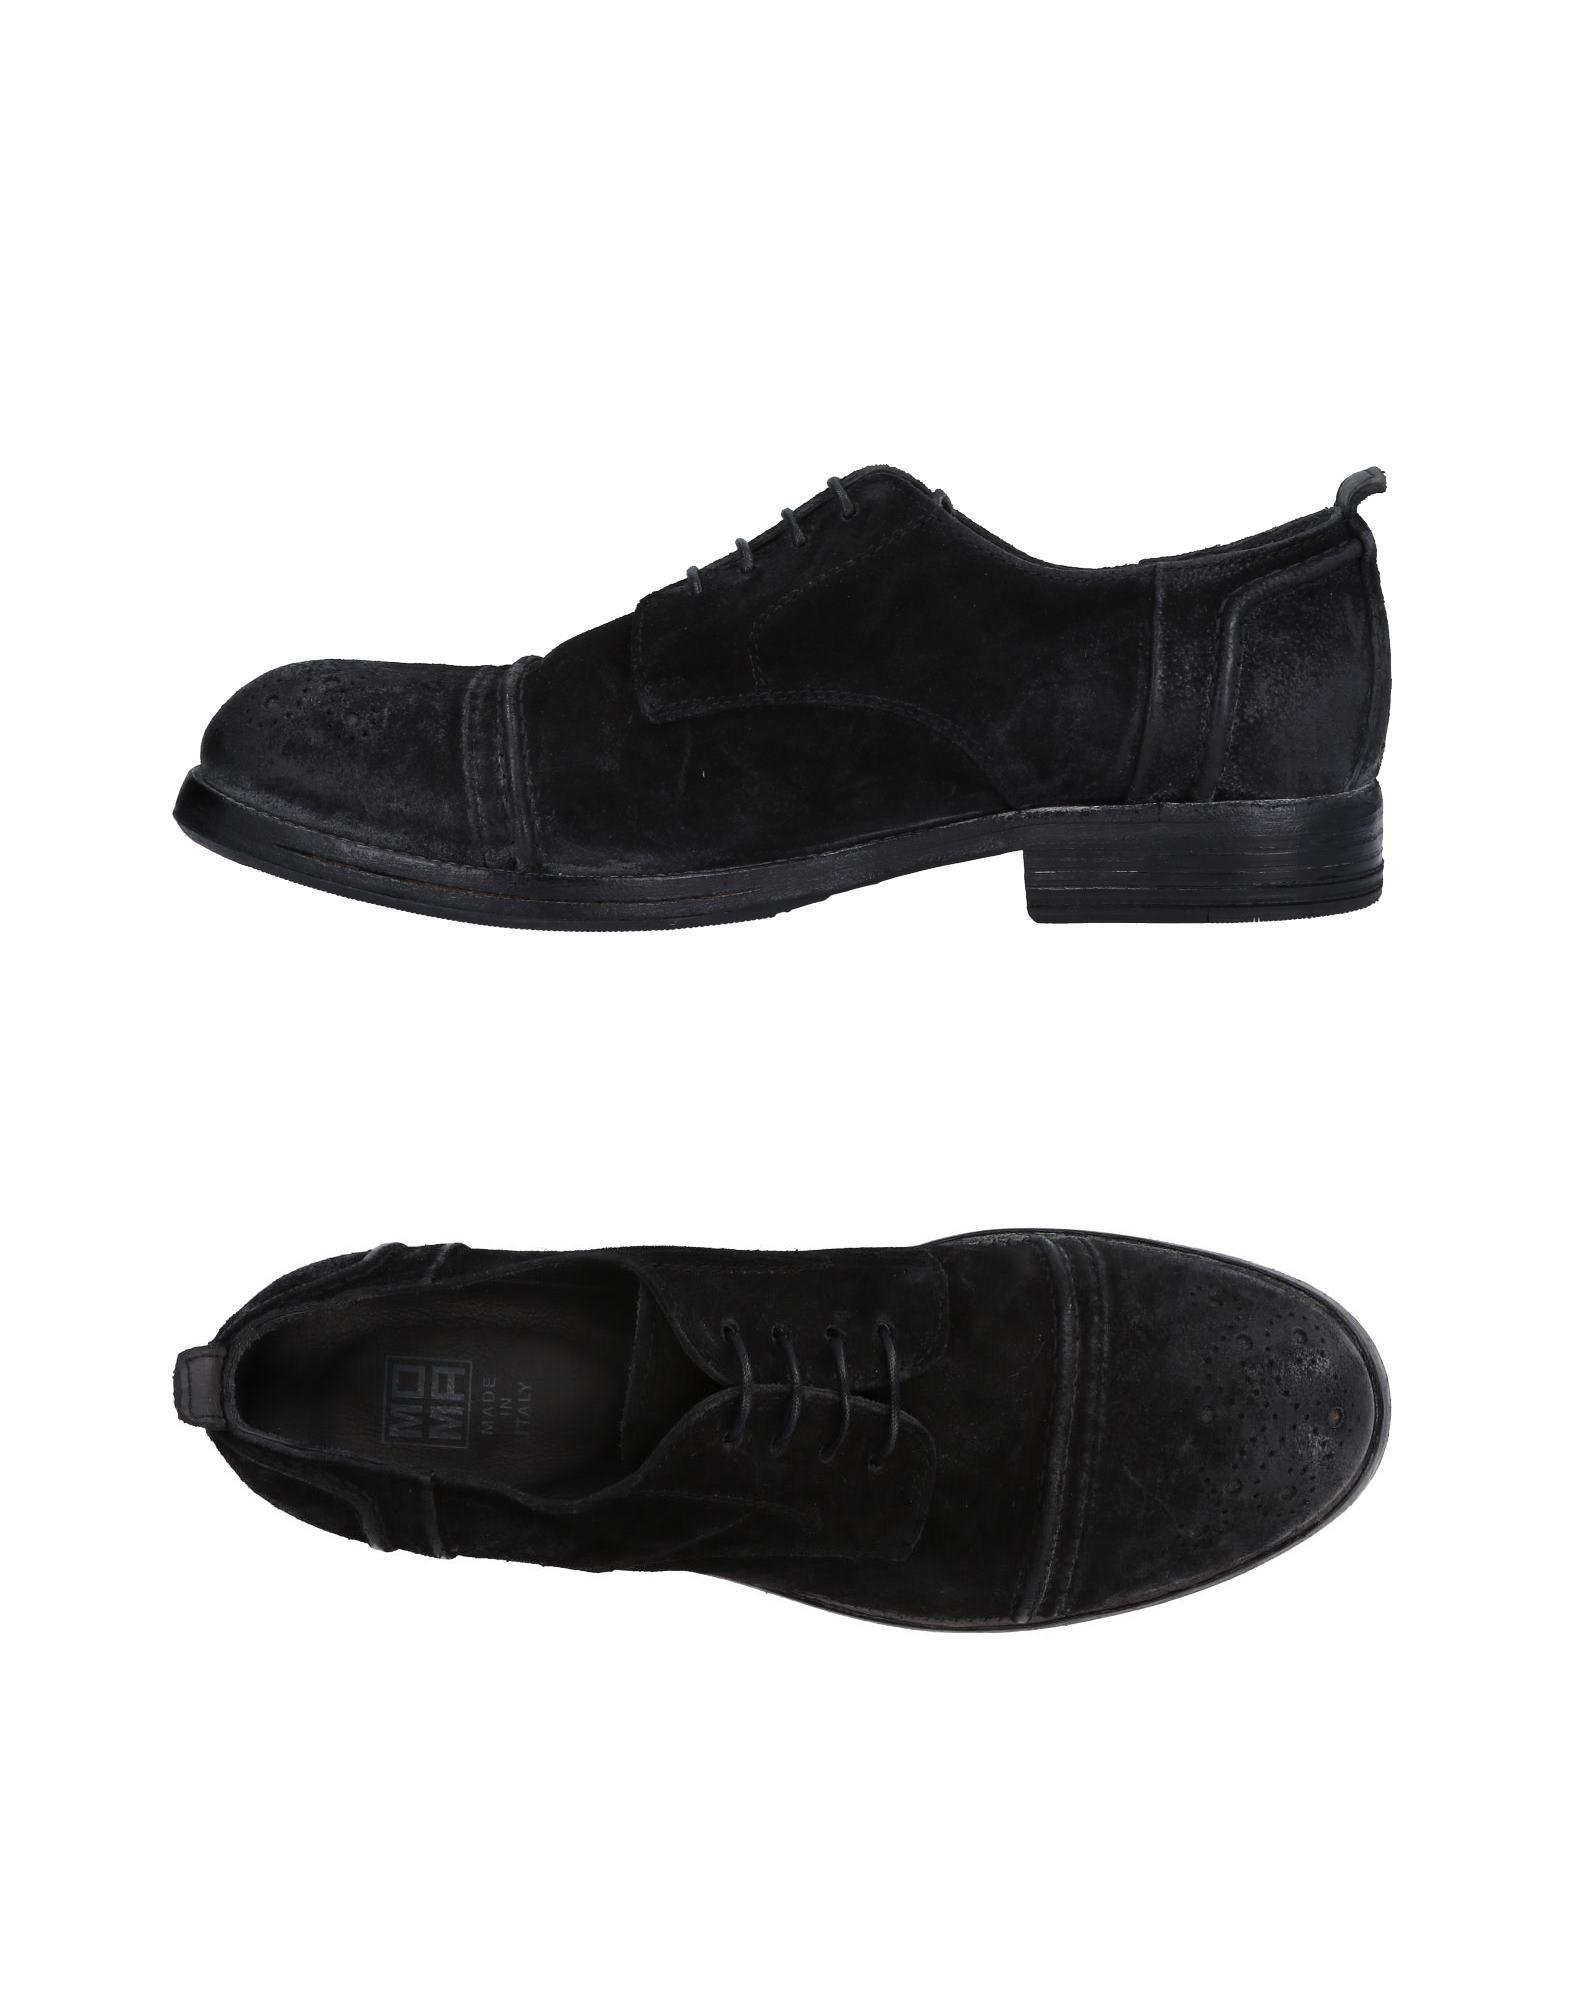 Moma Schuhe Schnürschuhe Herren  11498320KE Heiße Schuhe Moma 33aa50